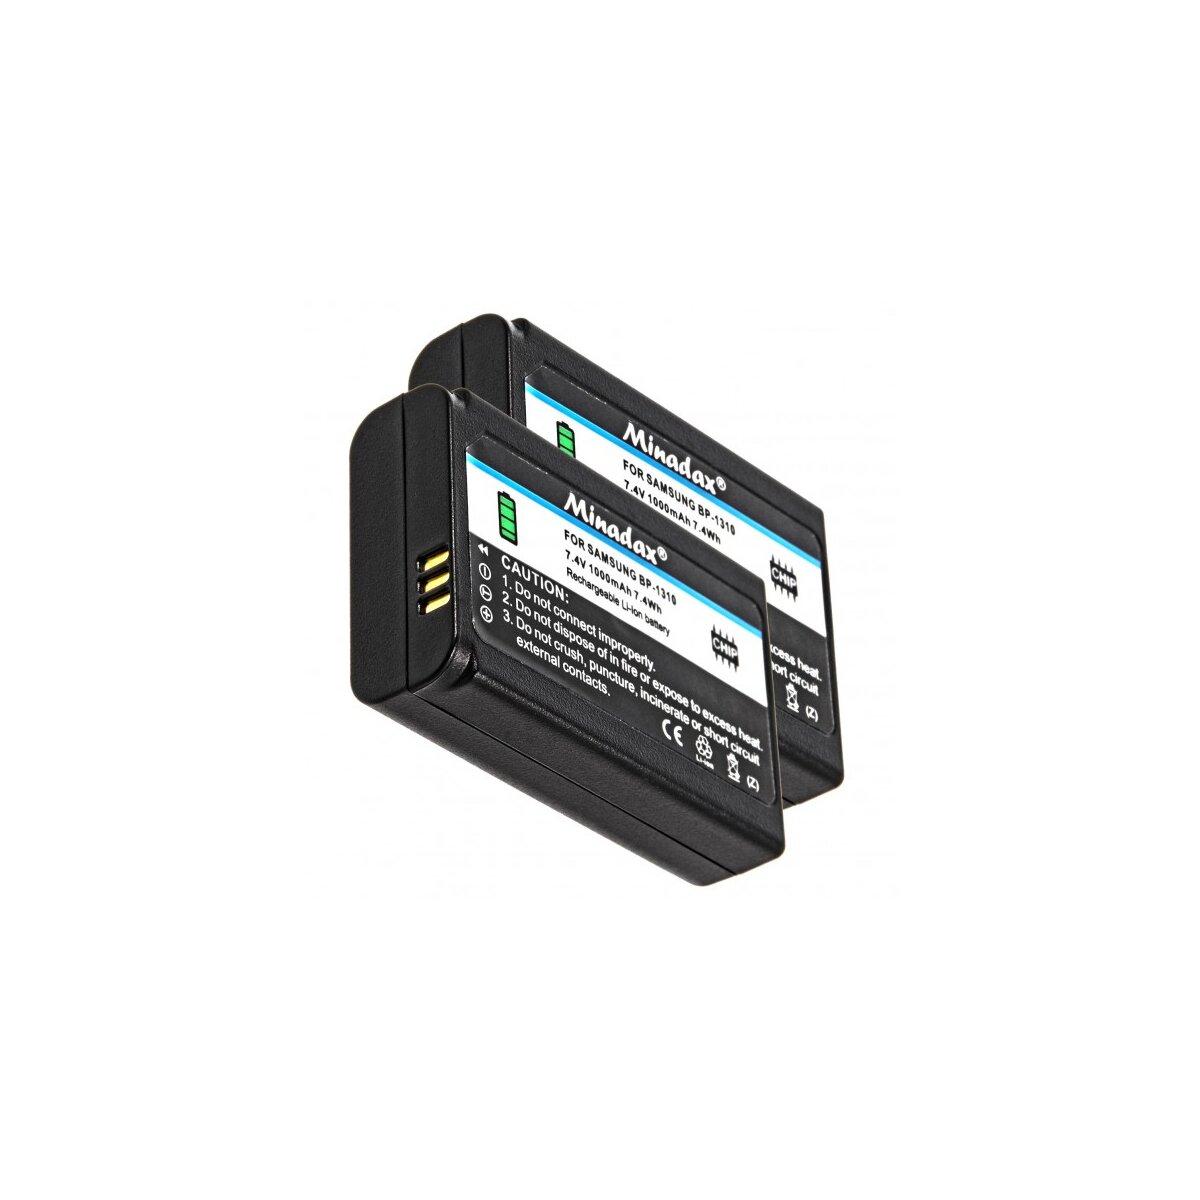 2x Minadax® Qualitaetsakku mit echten 1000 mAh fuer Samsung NX5 NX10 NX11 NX20 NX100, wie BP-1310 - Intelligentes Akkusystem mit Chip